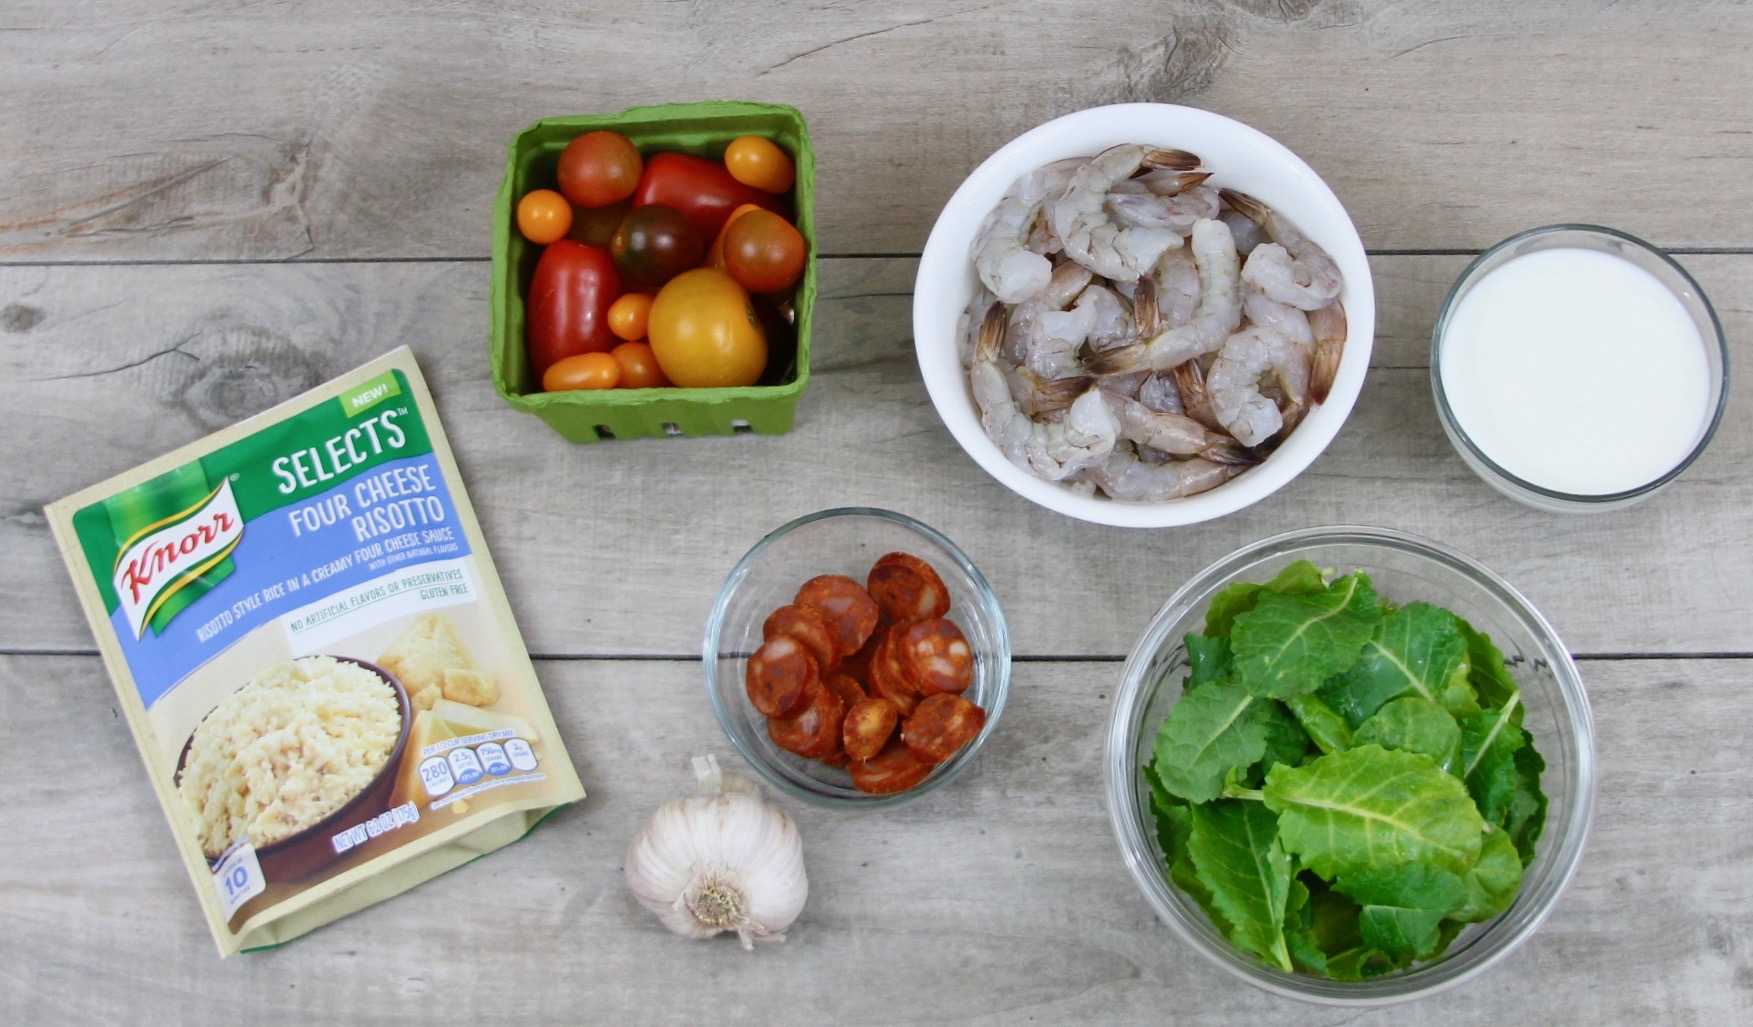 Garlic shrimp and chorizo risotto ingredients